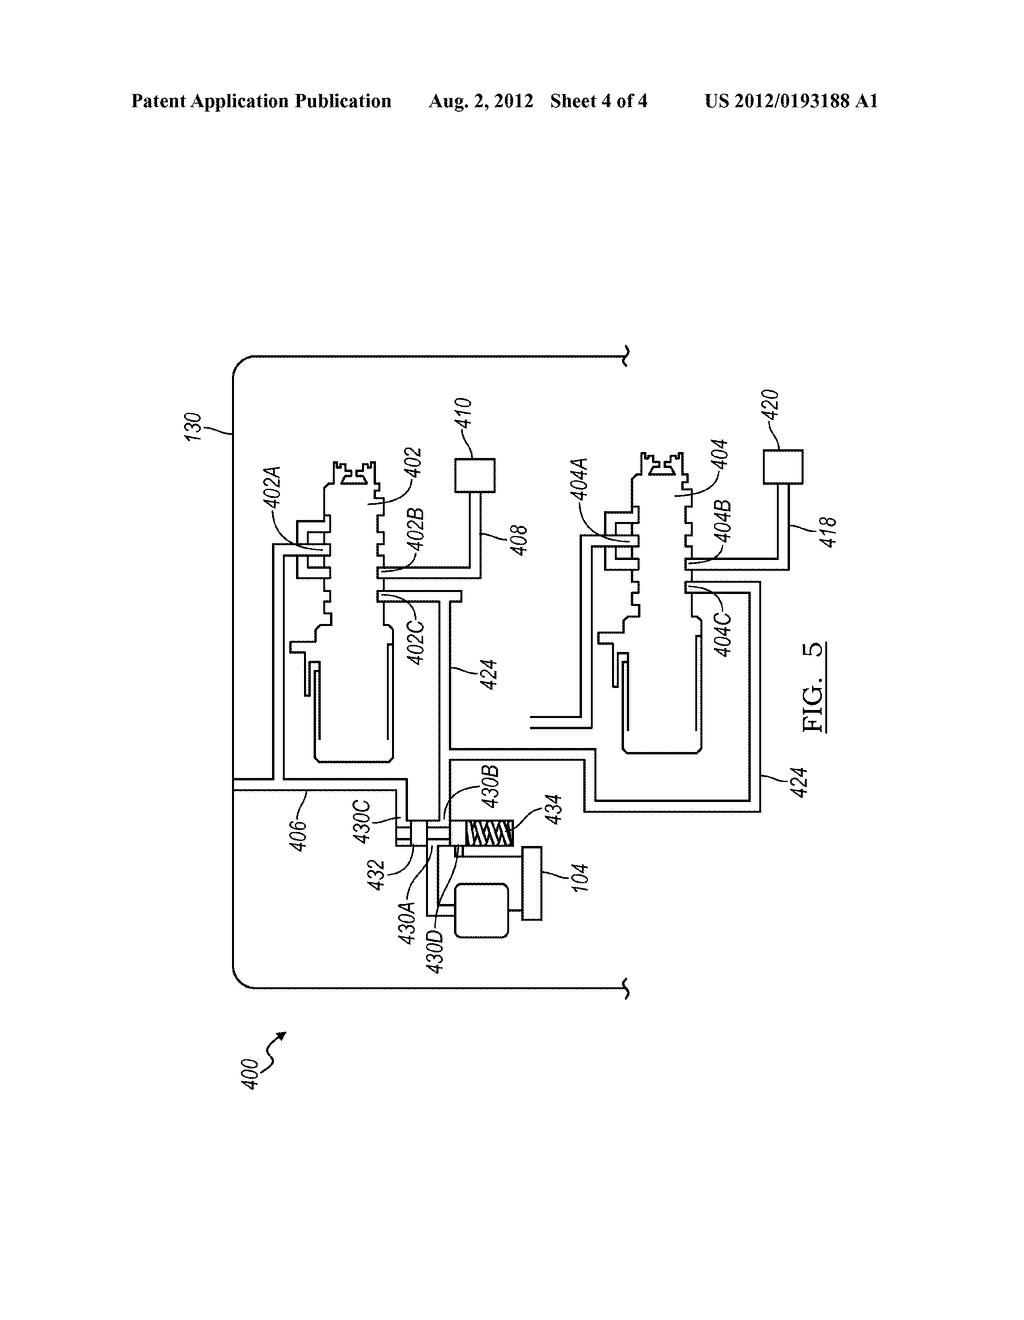 kohler magnum 20 hp wiring diagram vectra b mid 14 mand engine imageresizertool com